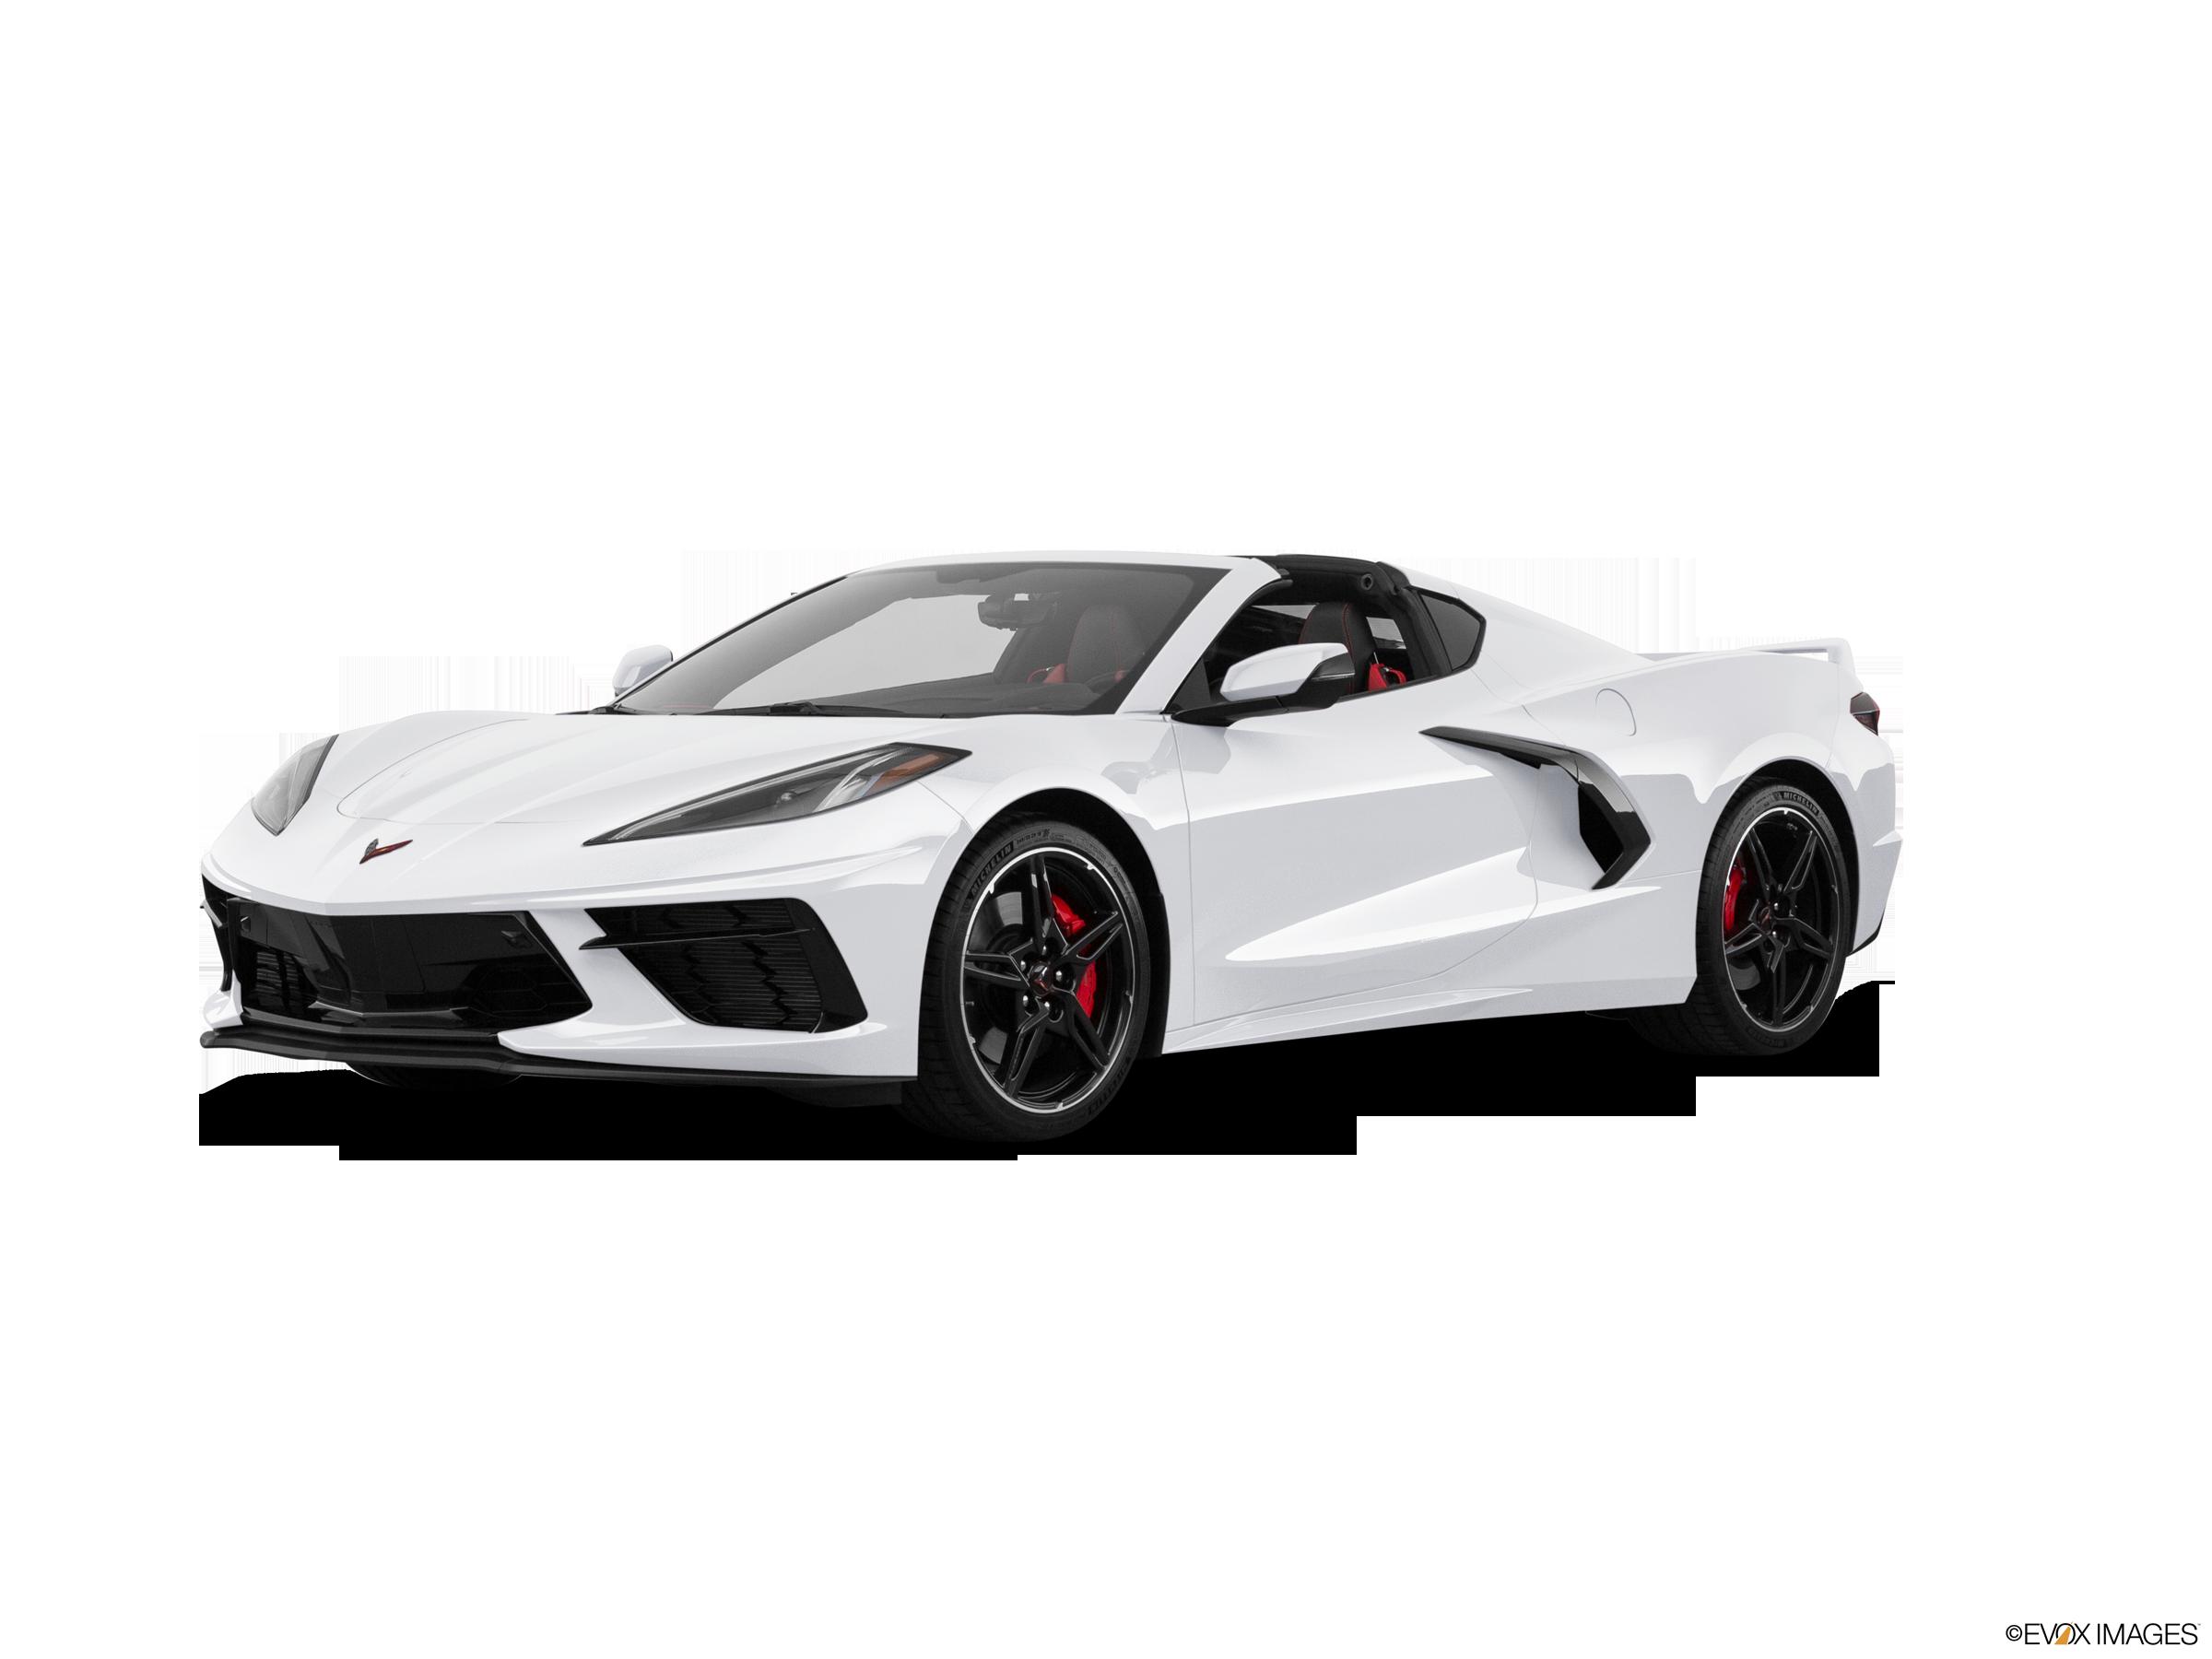 2021 Chevrolet Corvette Prices, Reviews & Pictures | Kelley Blue Book